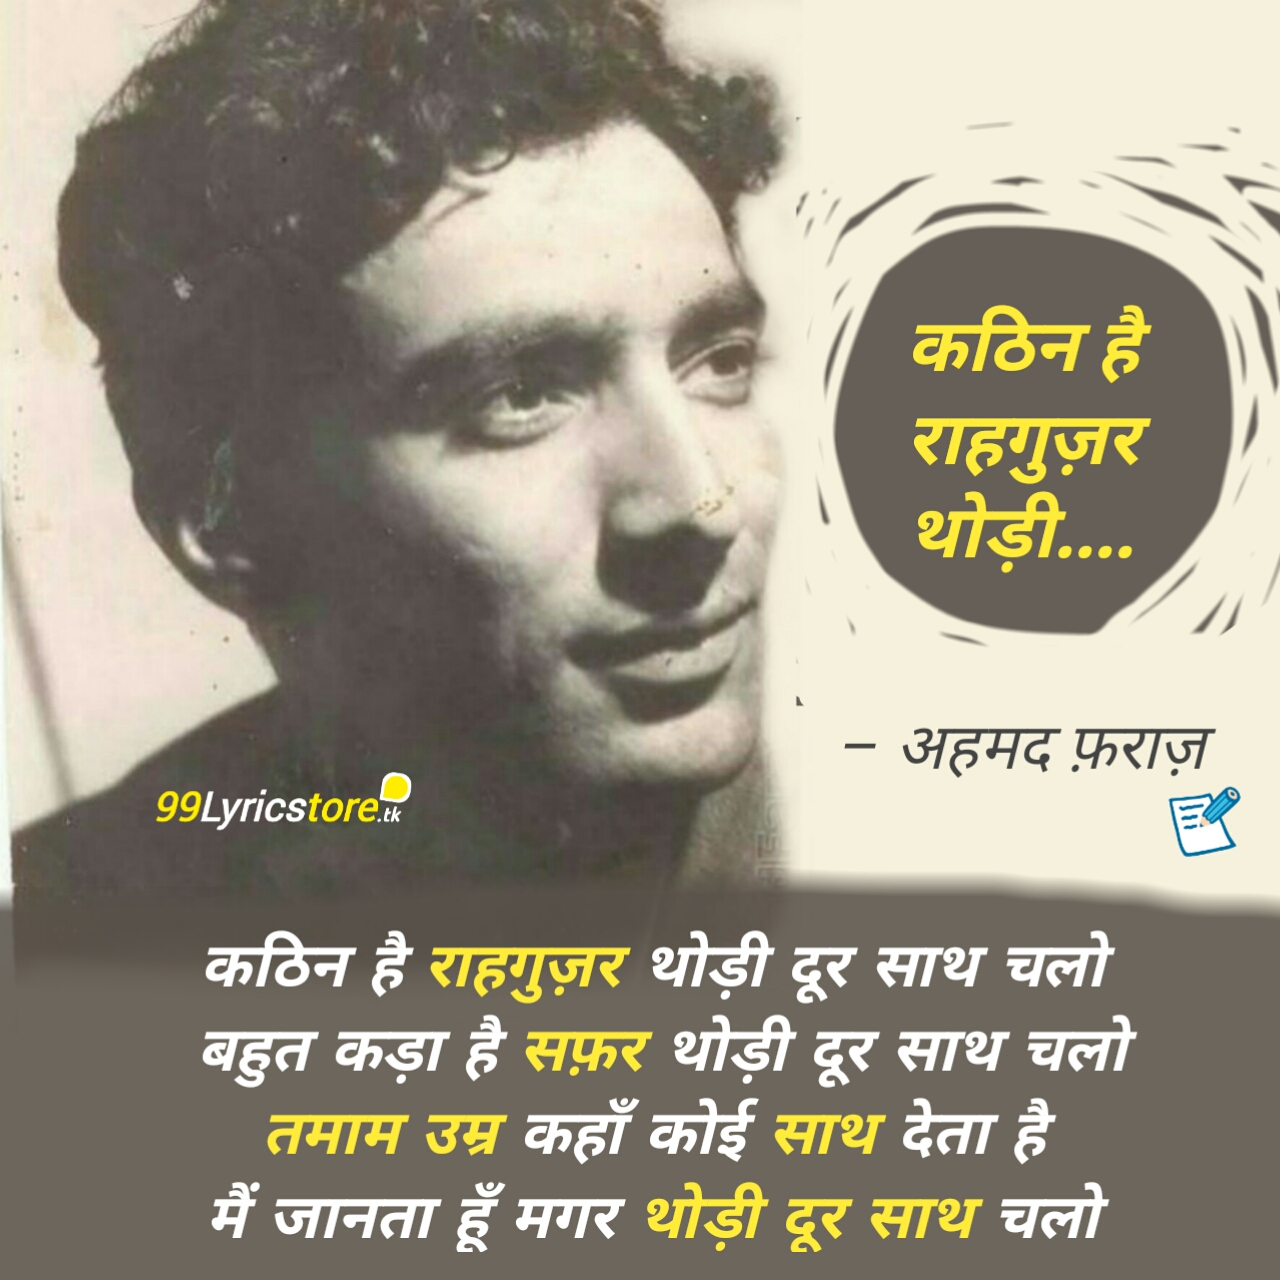 This beautiful Ghazal is 'Kathin Hai Raahgujar Thodi Door Saath Chalo' written by Ahmed Faraz. This Ghazal of Ahmed Faraz is sung with Pankaj Udas very beautifully